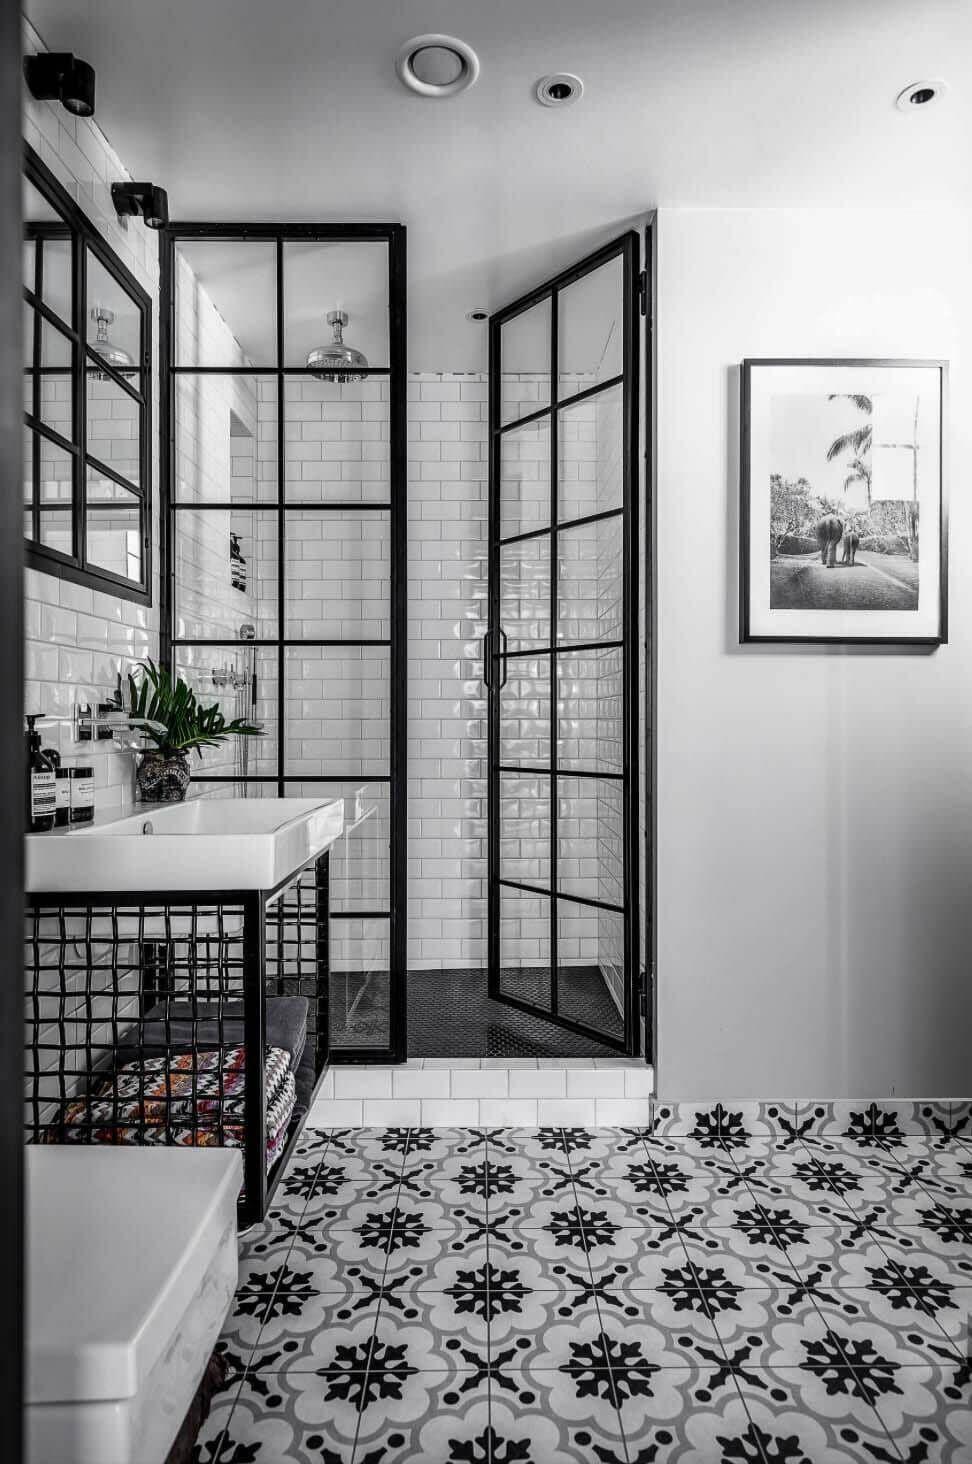 55 Extremely Stunning Bathroom Tile Ideas 2020 You Should Try Dovenda In 2020 Industrial Bathroom Design Bathroom Interior Black White Bathrooms